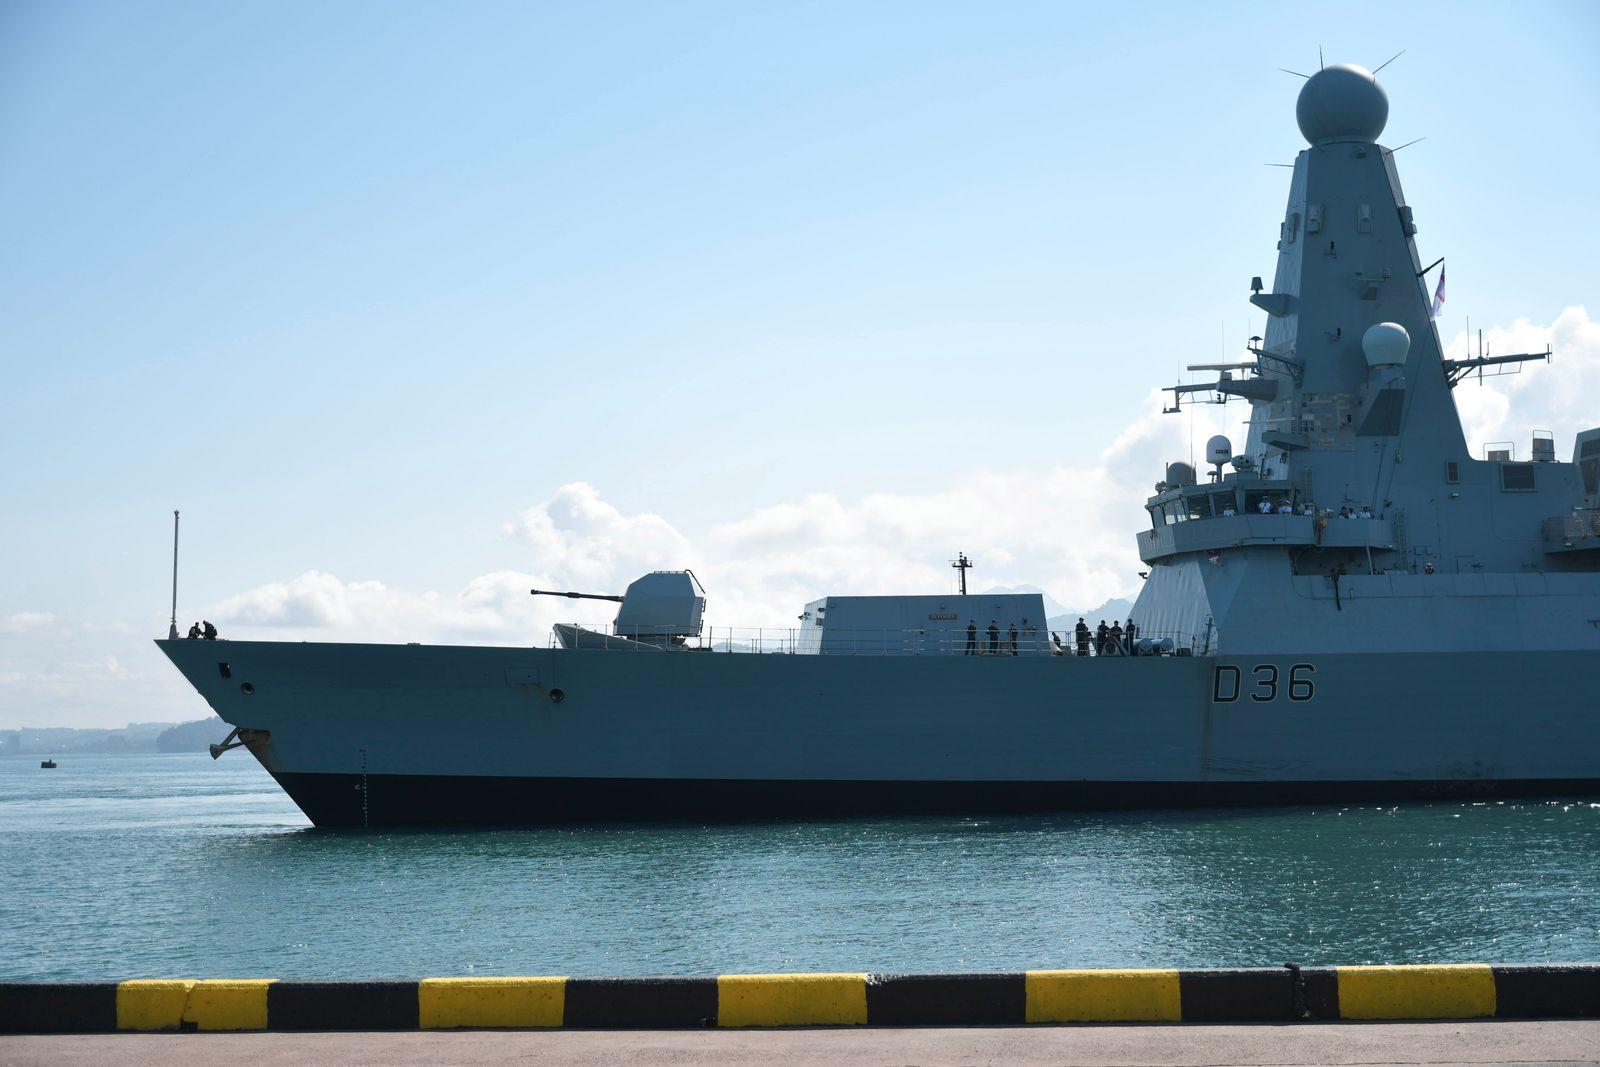 British destroyer HMS Defender in Georgian port of Batumi